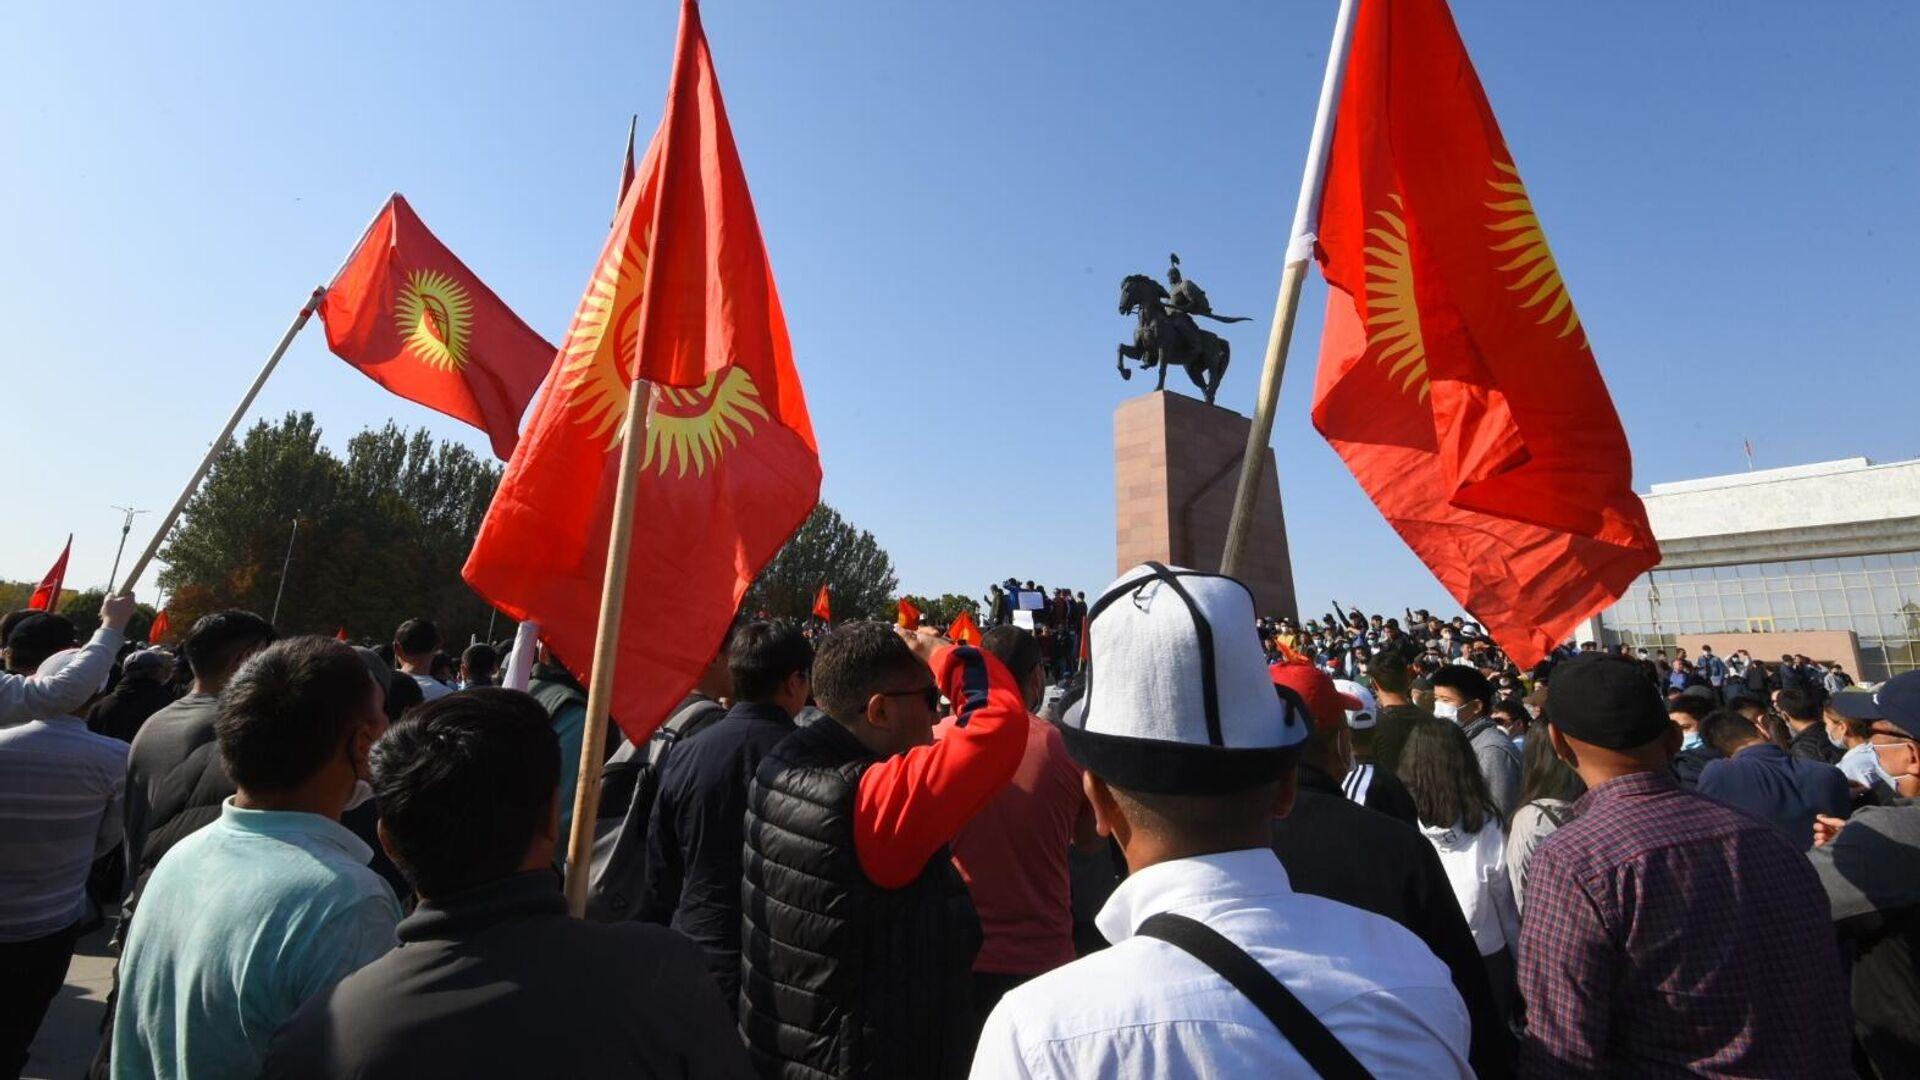 Участники акции протеста в Бишкеке - РИА Новости, 1920, 24.10.2020